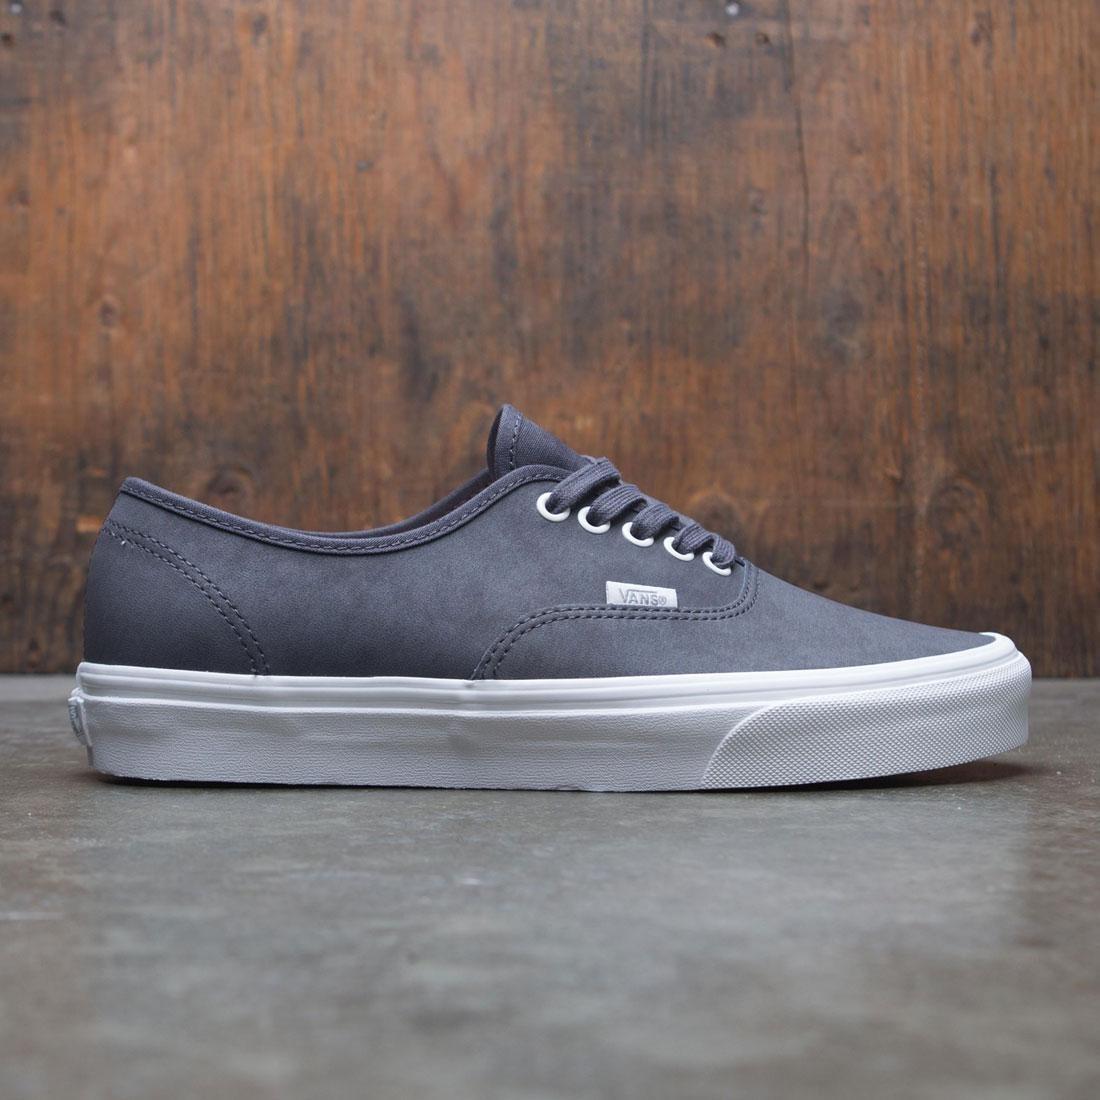 c0365d8833 Vans Men Authentic - Vansbuck Asphault gray